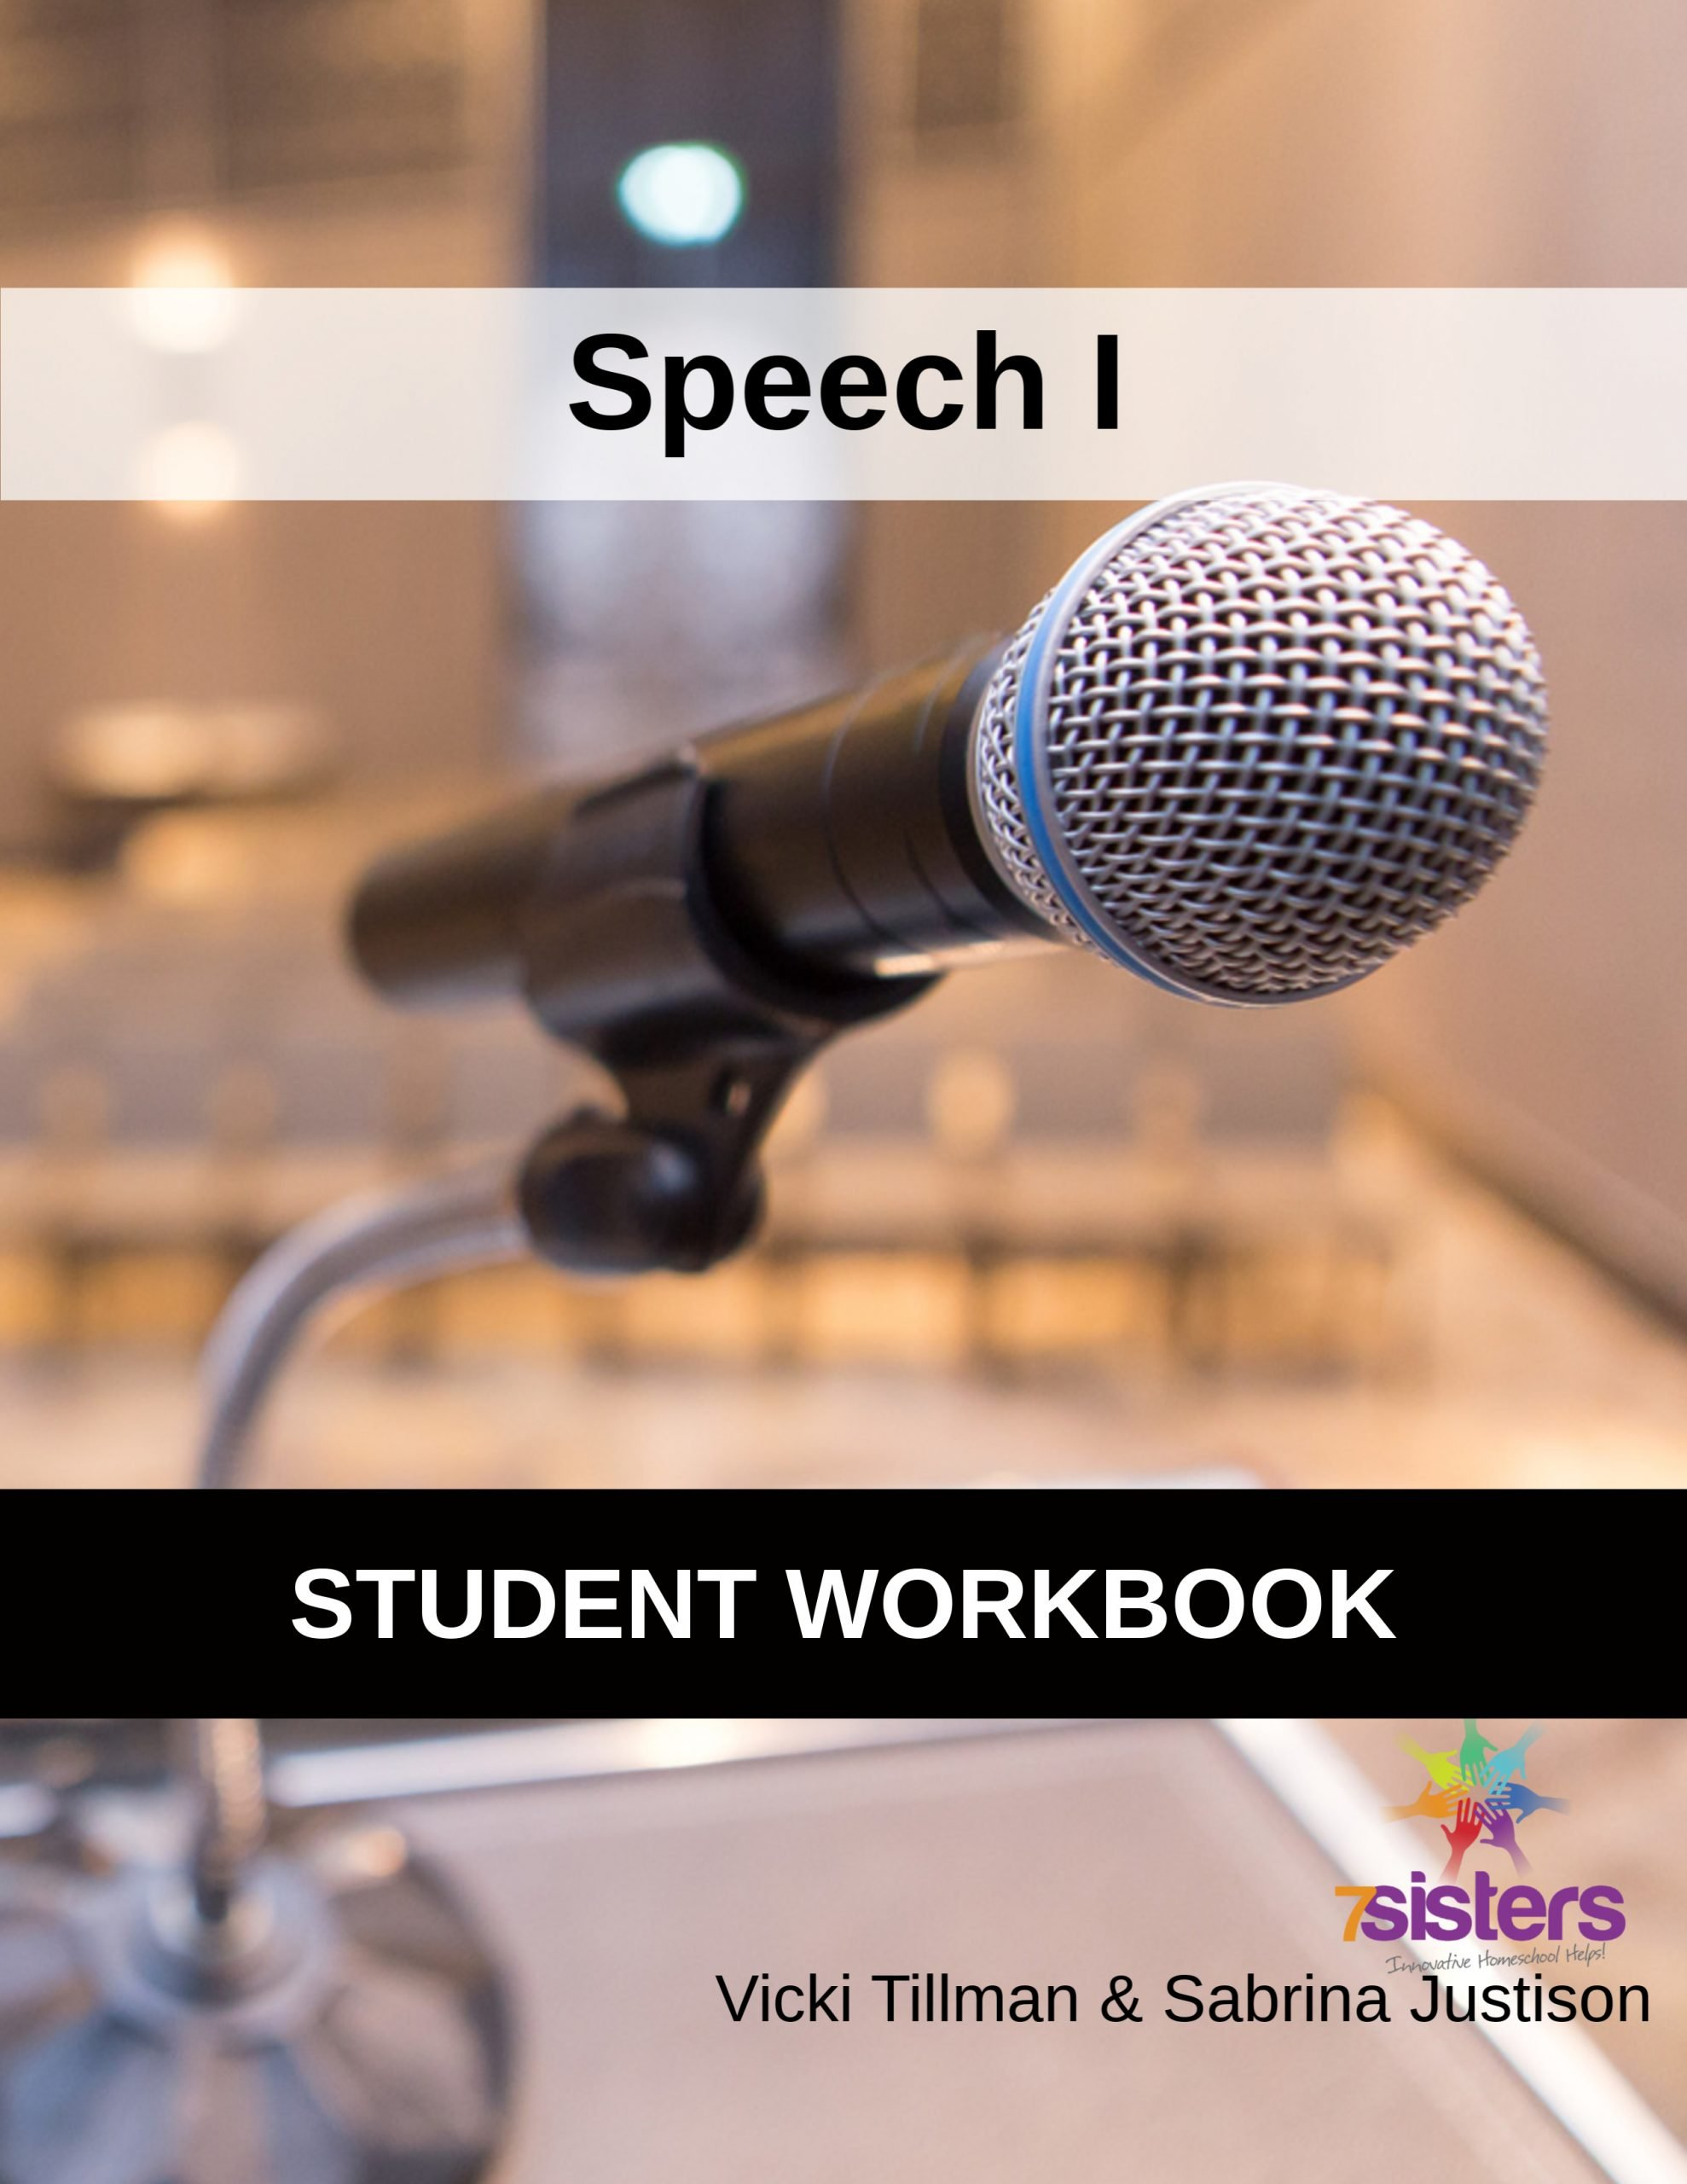 Speech I Workbook